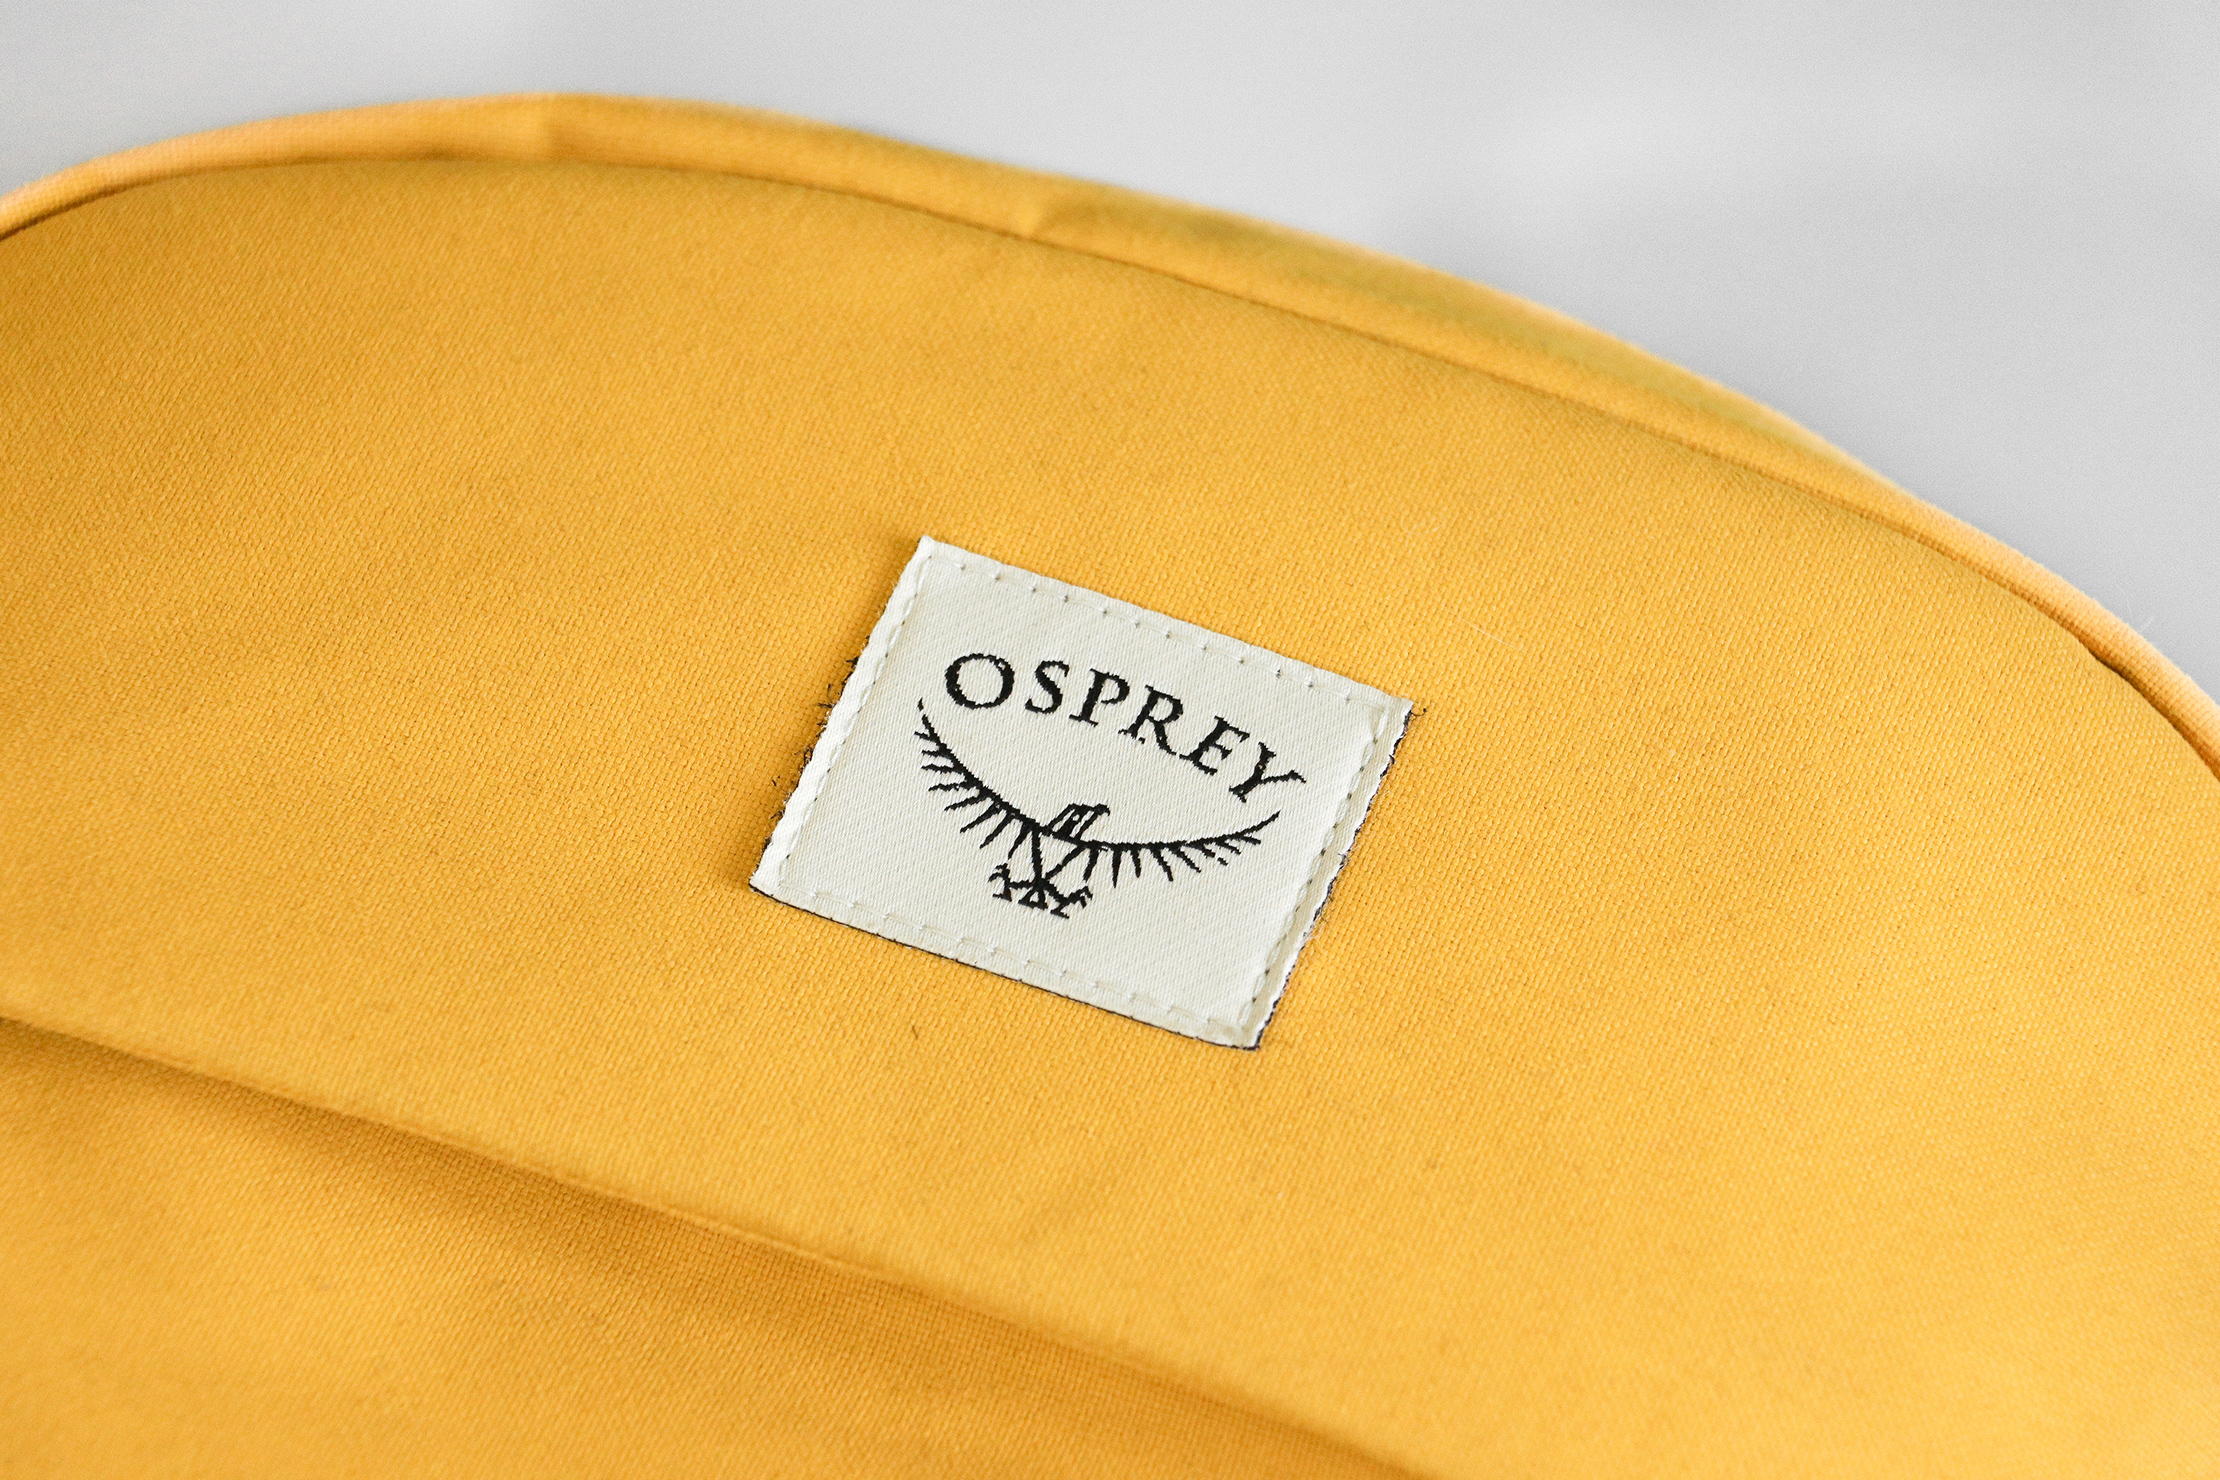 Osprey Arcane Large Day Pack (V2) Material and Logo